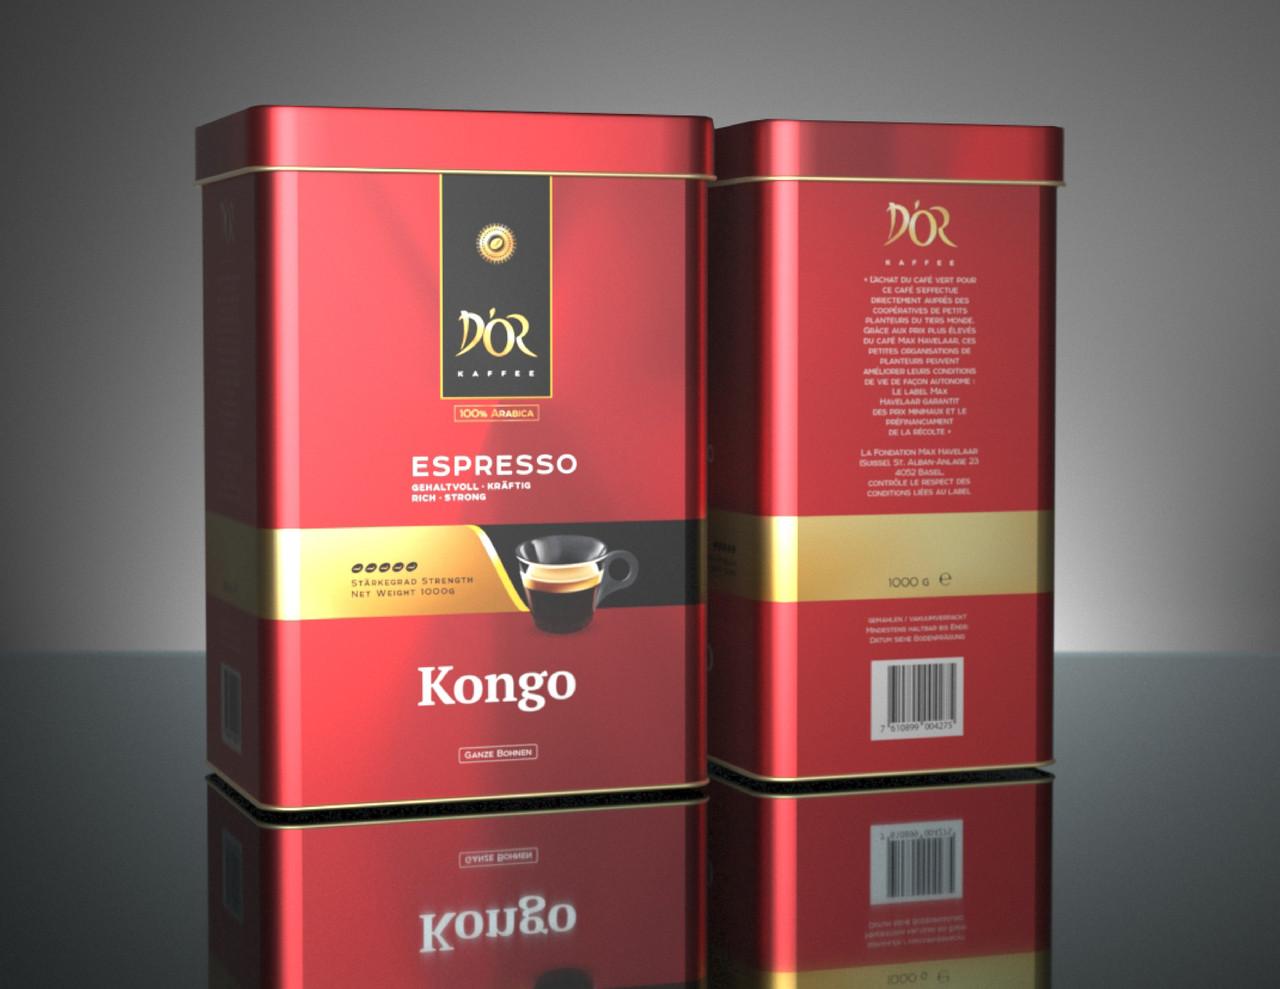 DOR Espresso розташовують kongo друкують 1 кг. зерно